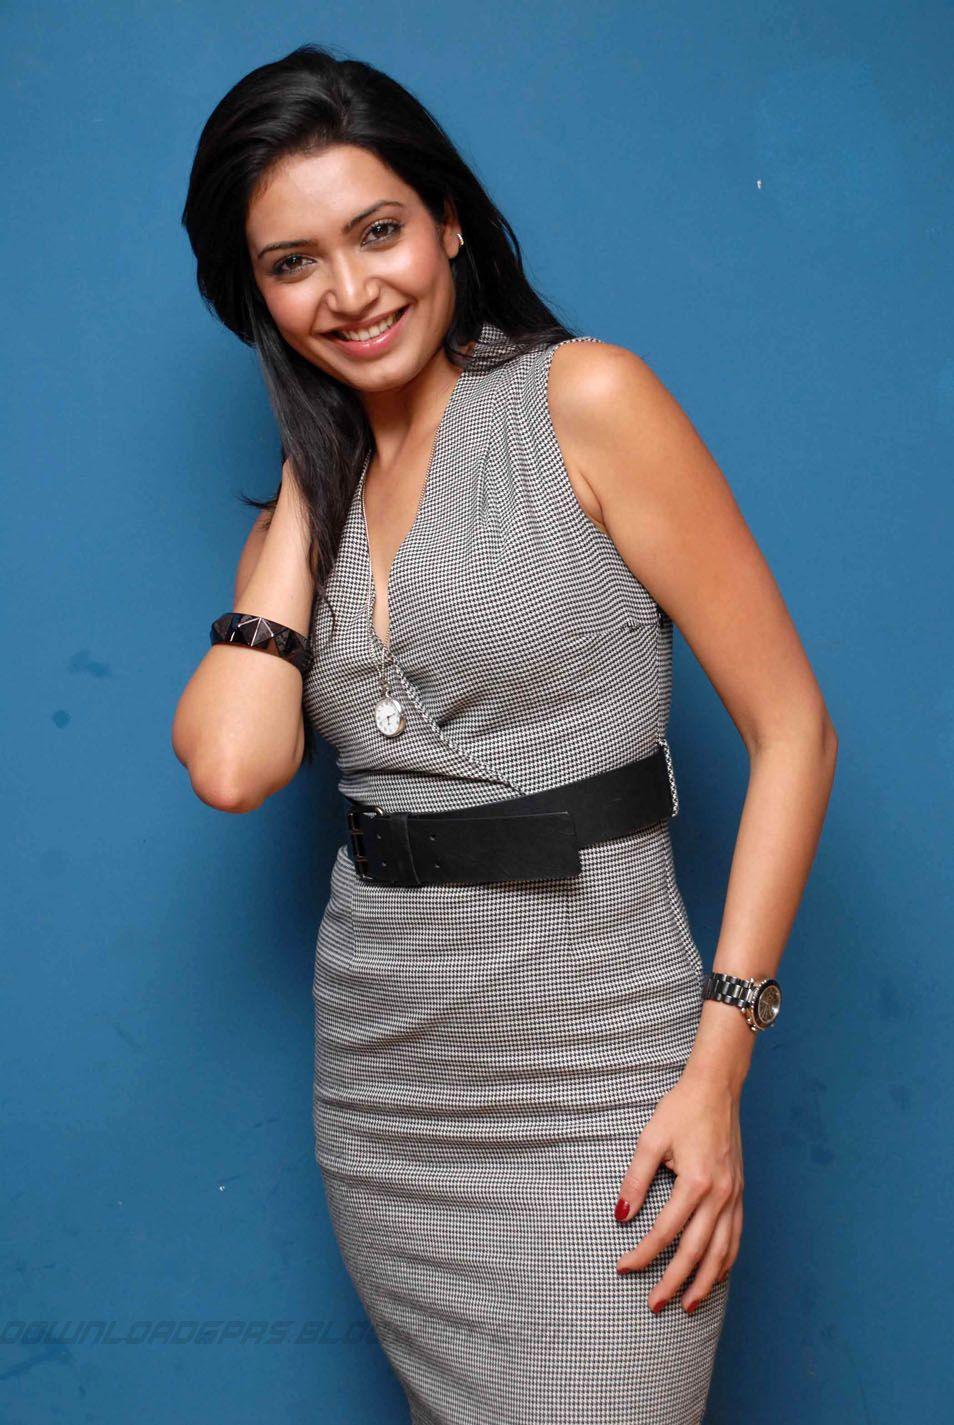 John Abraham Hd Wallpapers Force 2 Actress Karishma Tanna Latest Hot Photogallery Thuppaki